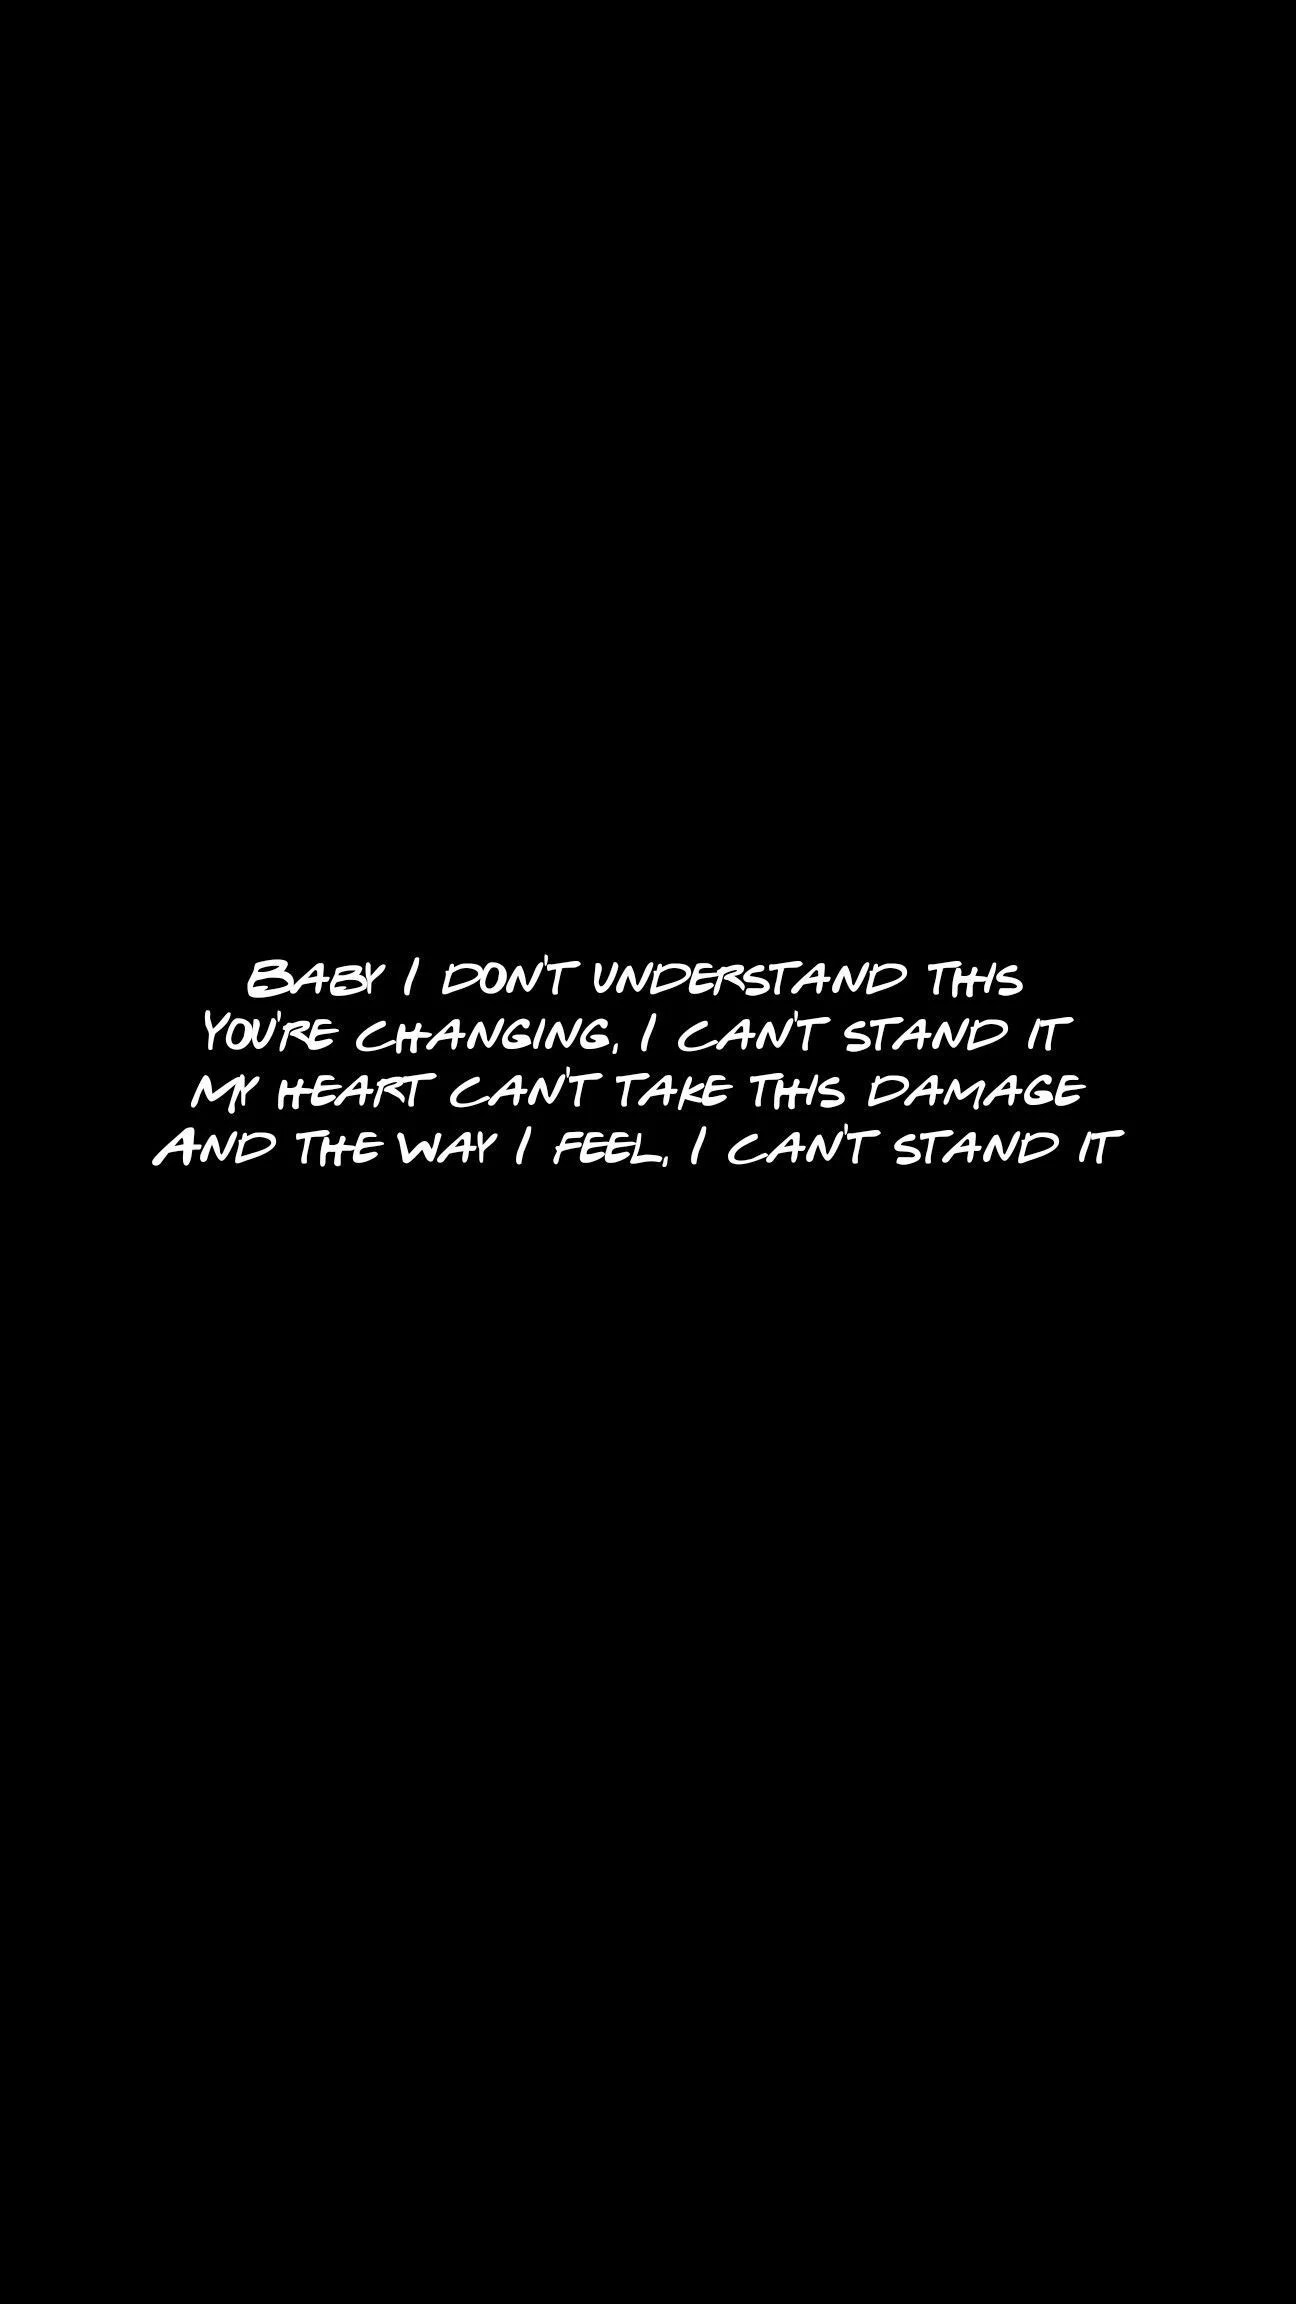 Depressed Sad Quotes About Life ...